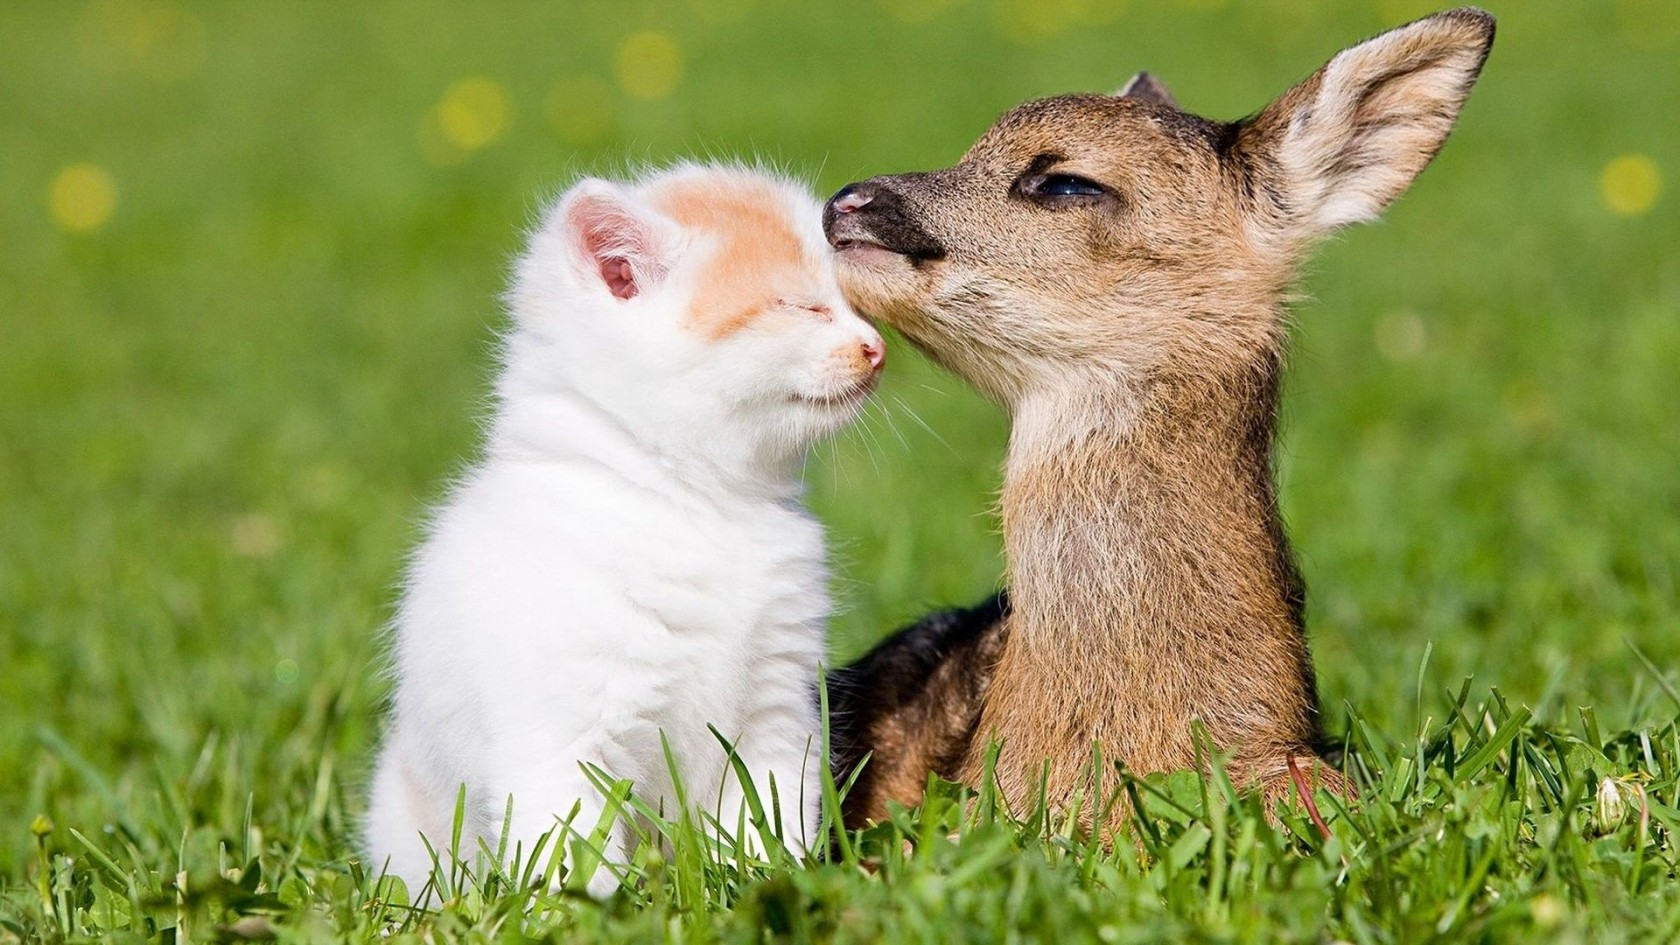 Those Cute Animals - Sharenator